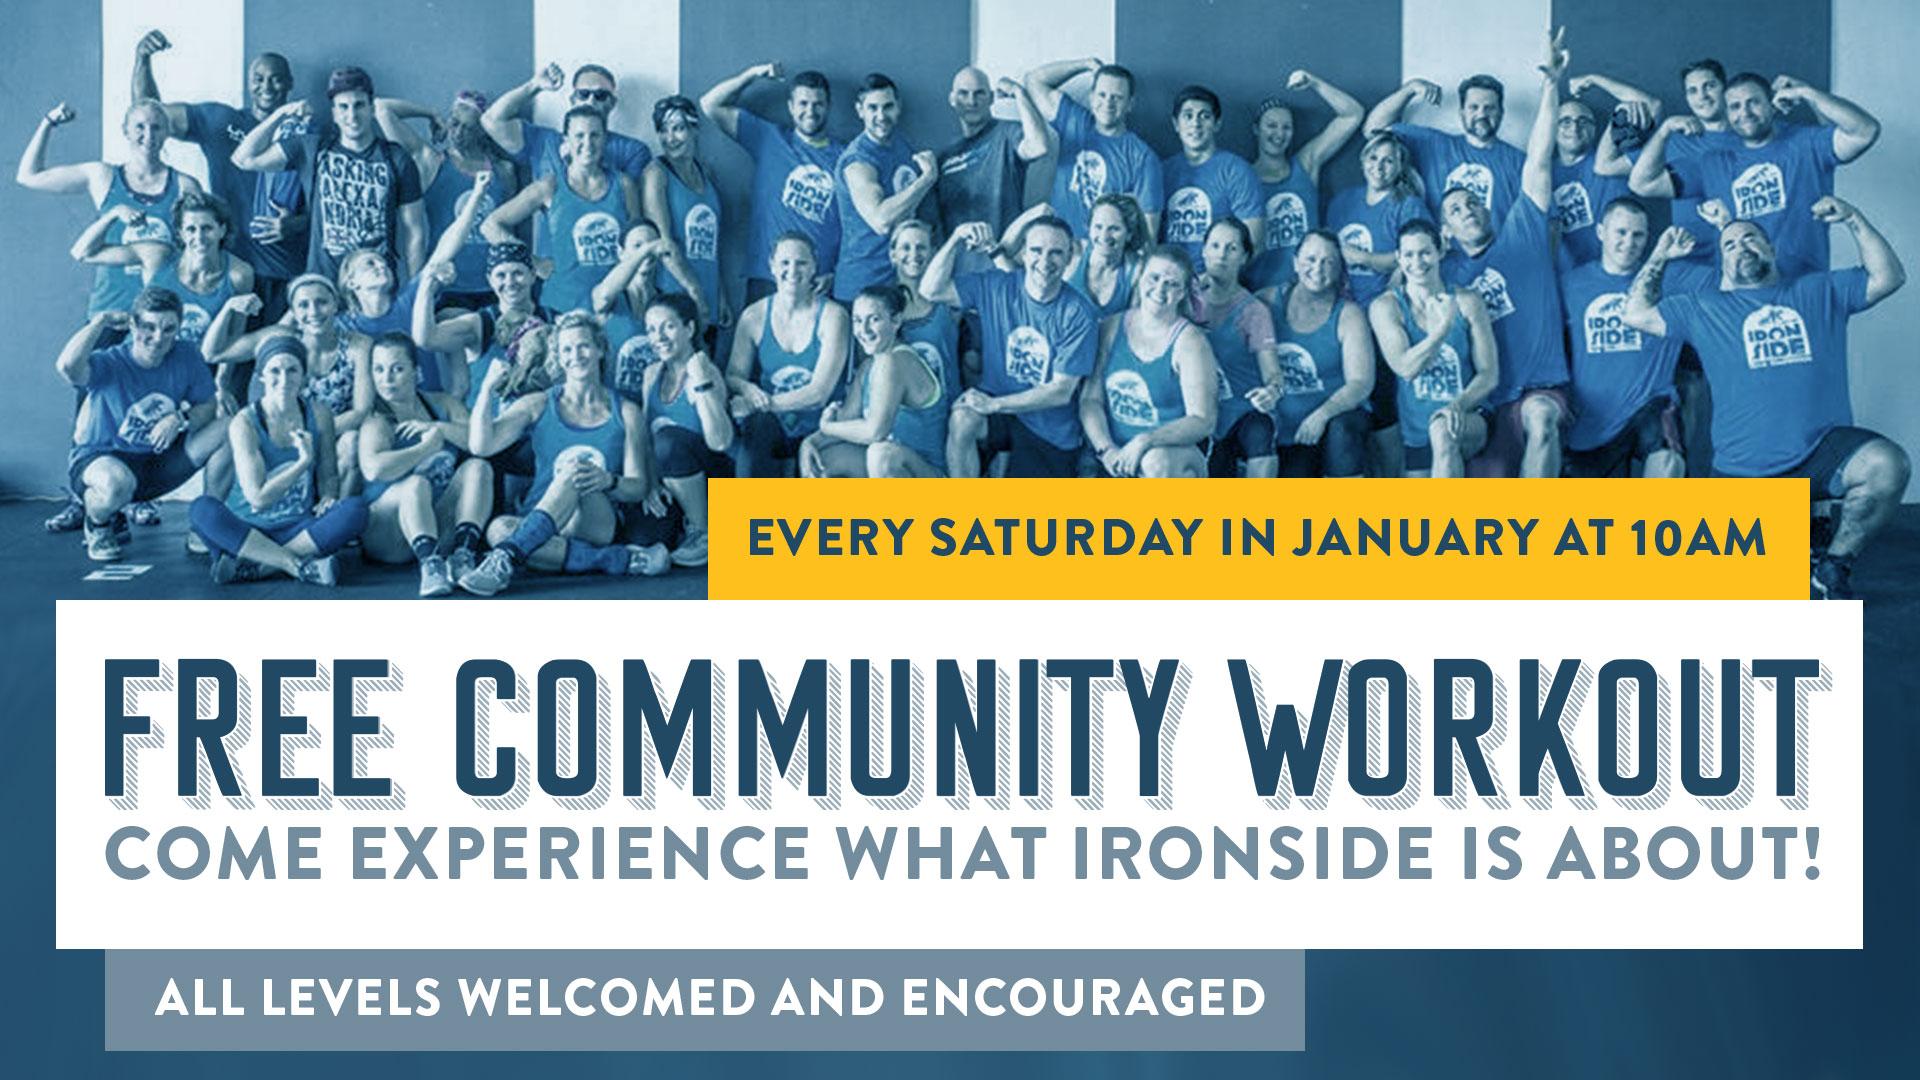 Crossfit Ironside - FREE Community Workout